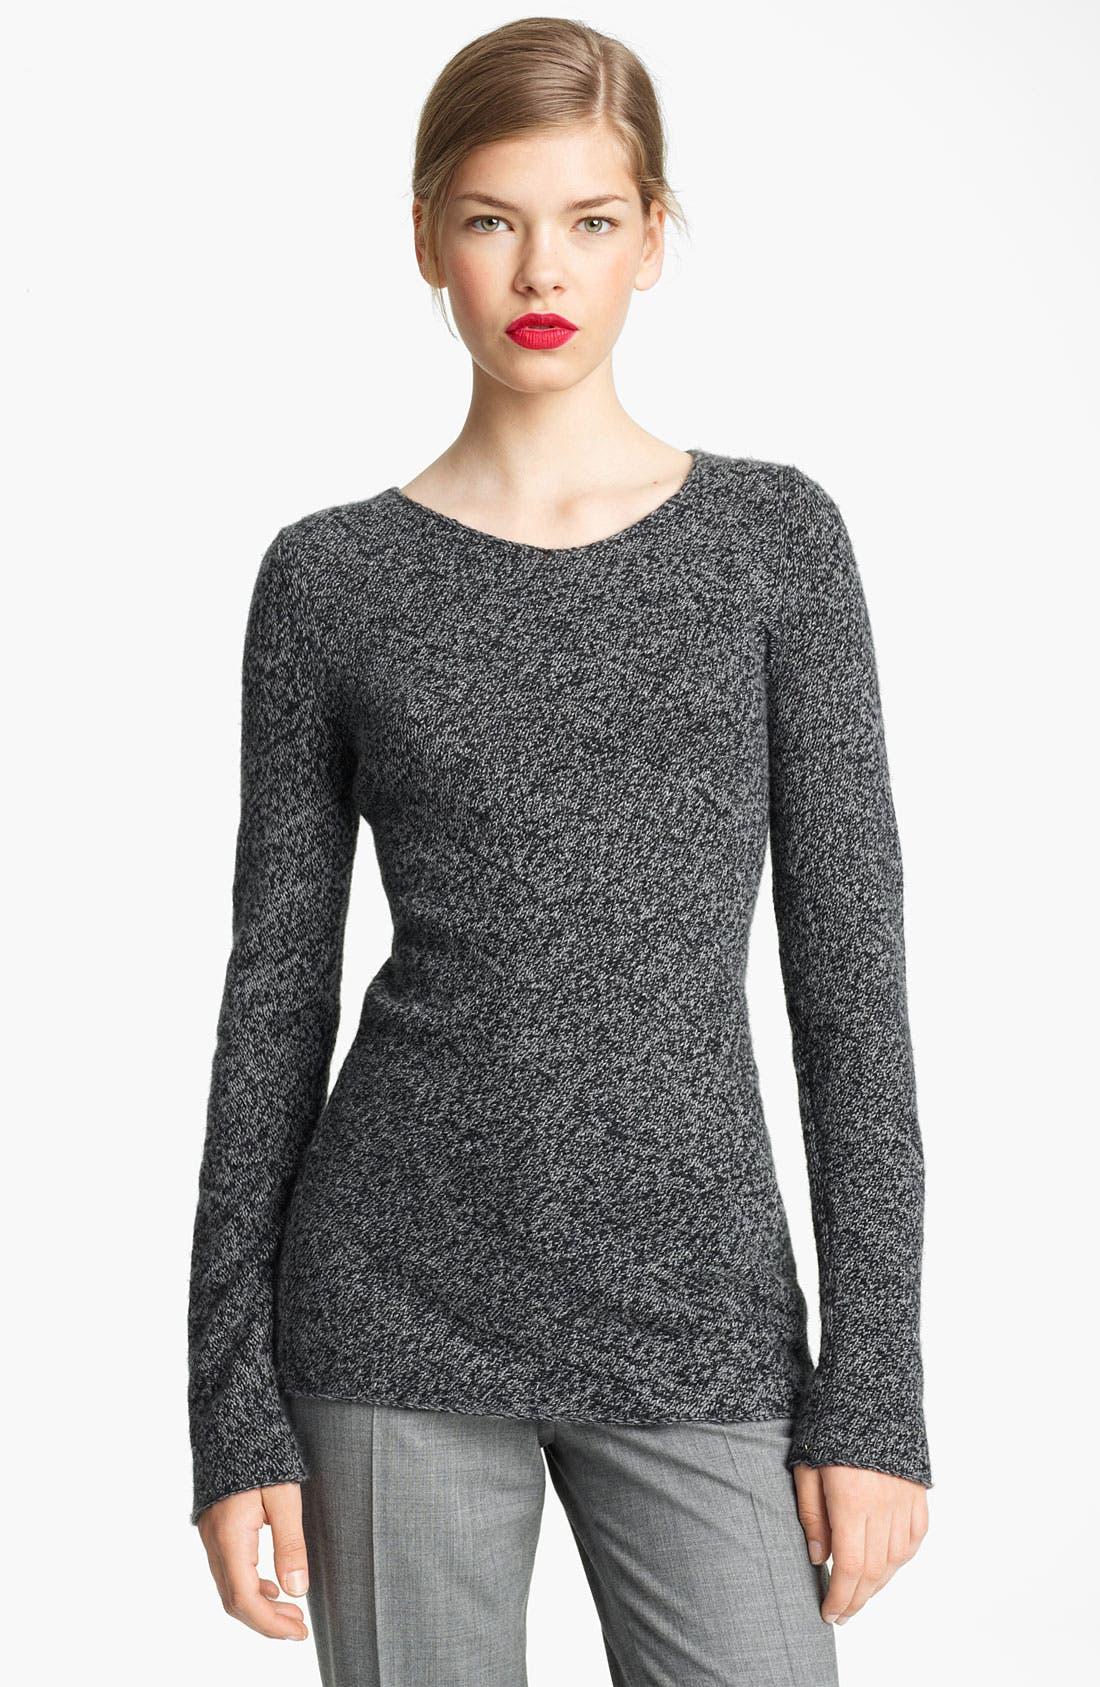 Main Image - Michael Kors Marled Cashmere Sweater